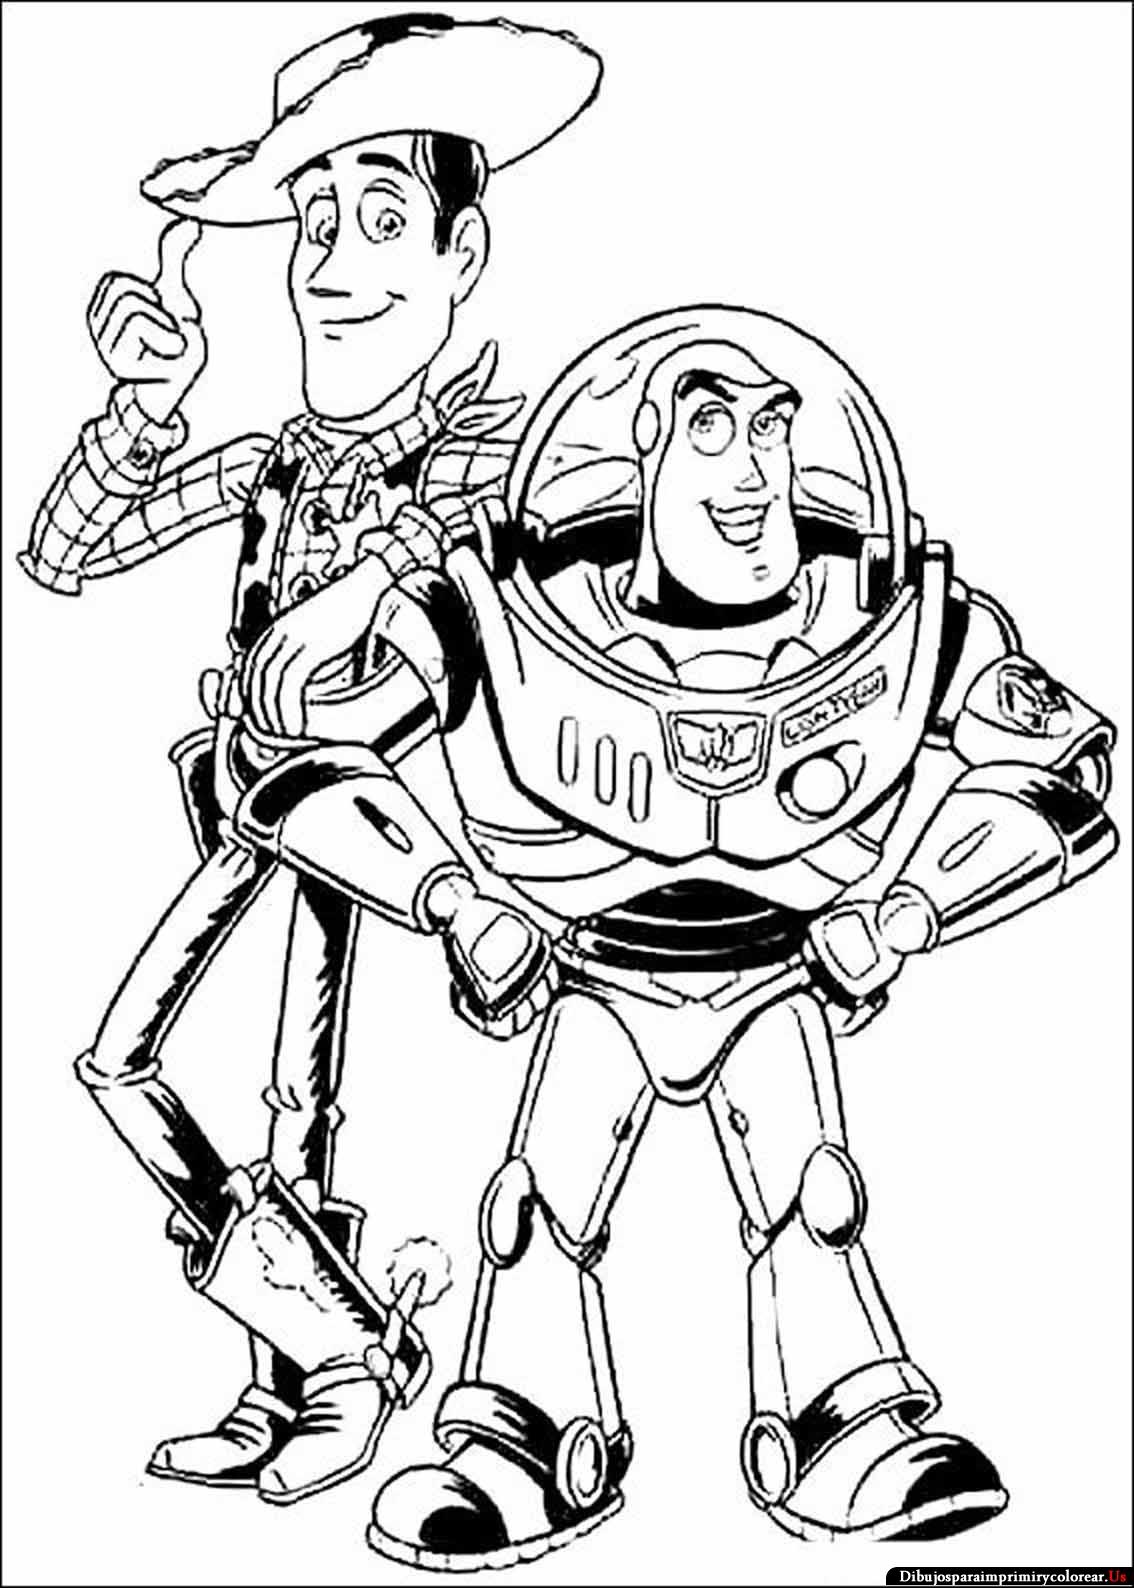 Dibujos de Toy Story para Imprimir y ColorearWoody And Buzz Drawing